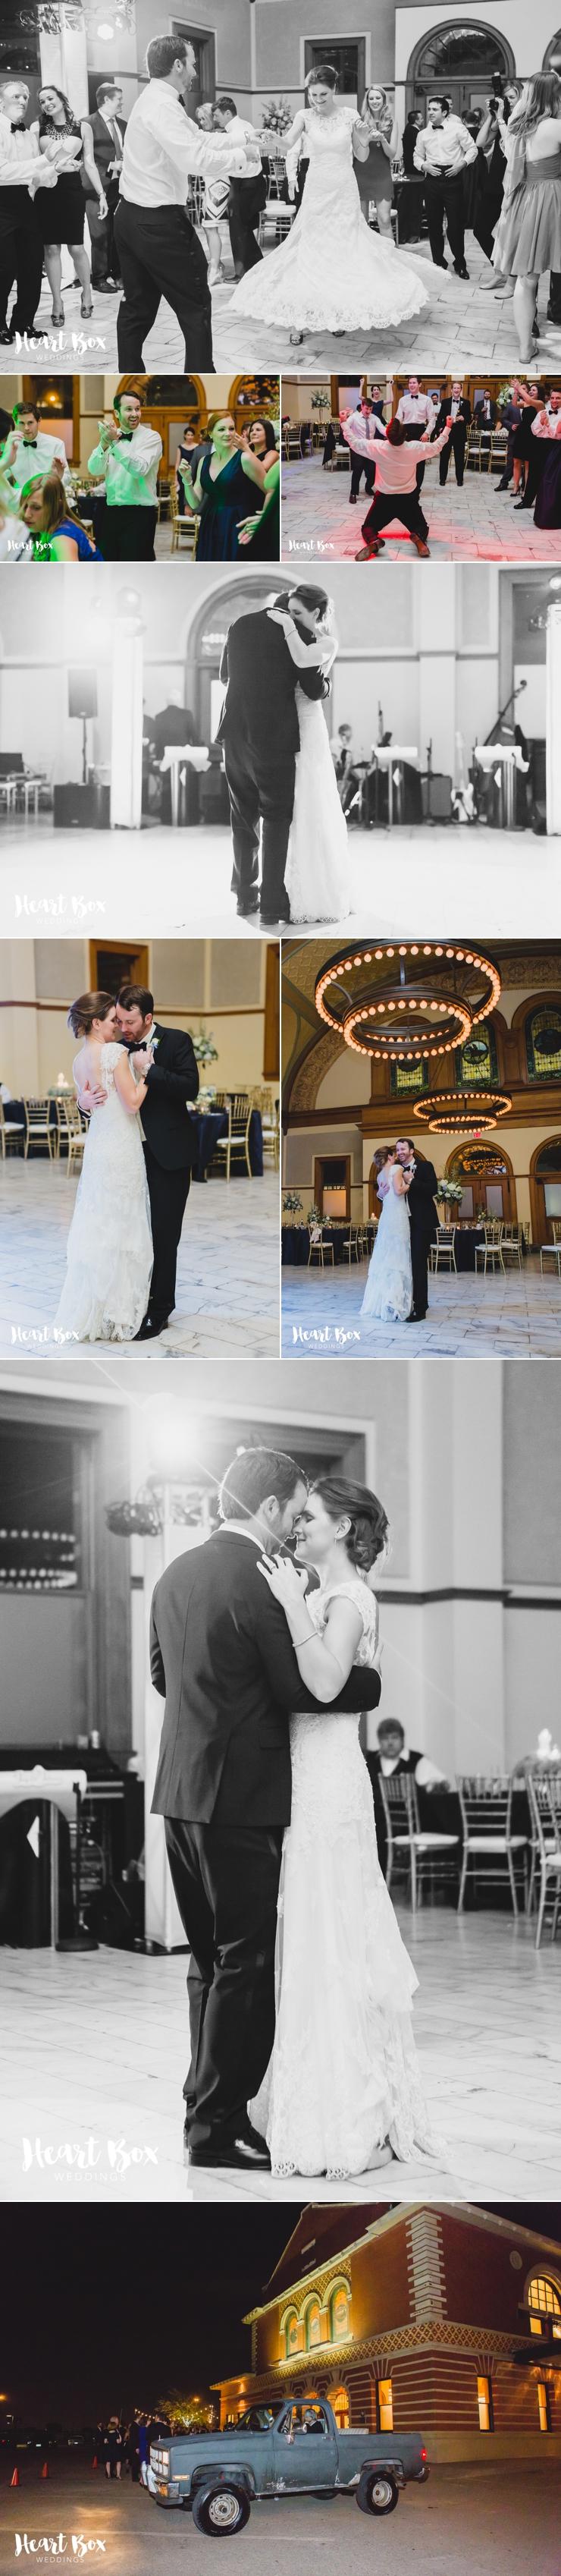 Anthony Wedding Blog Collages 24.jpg